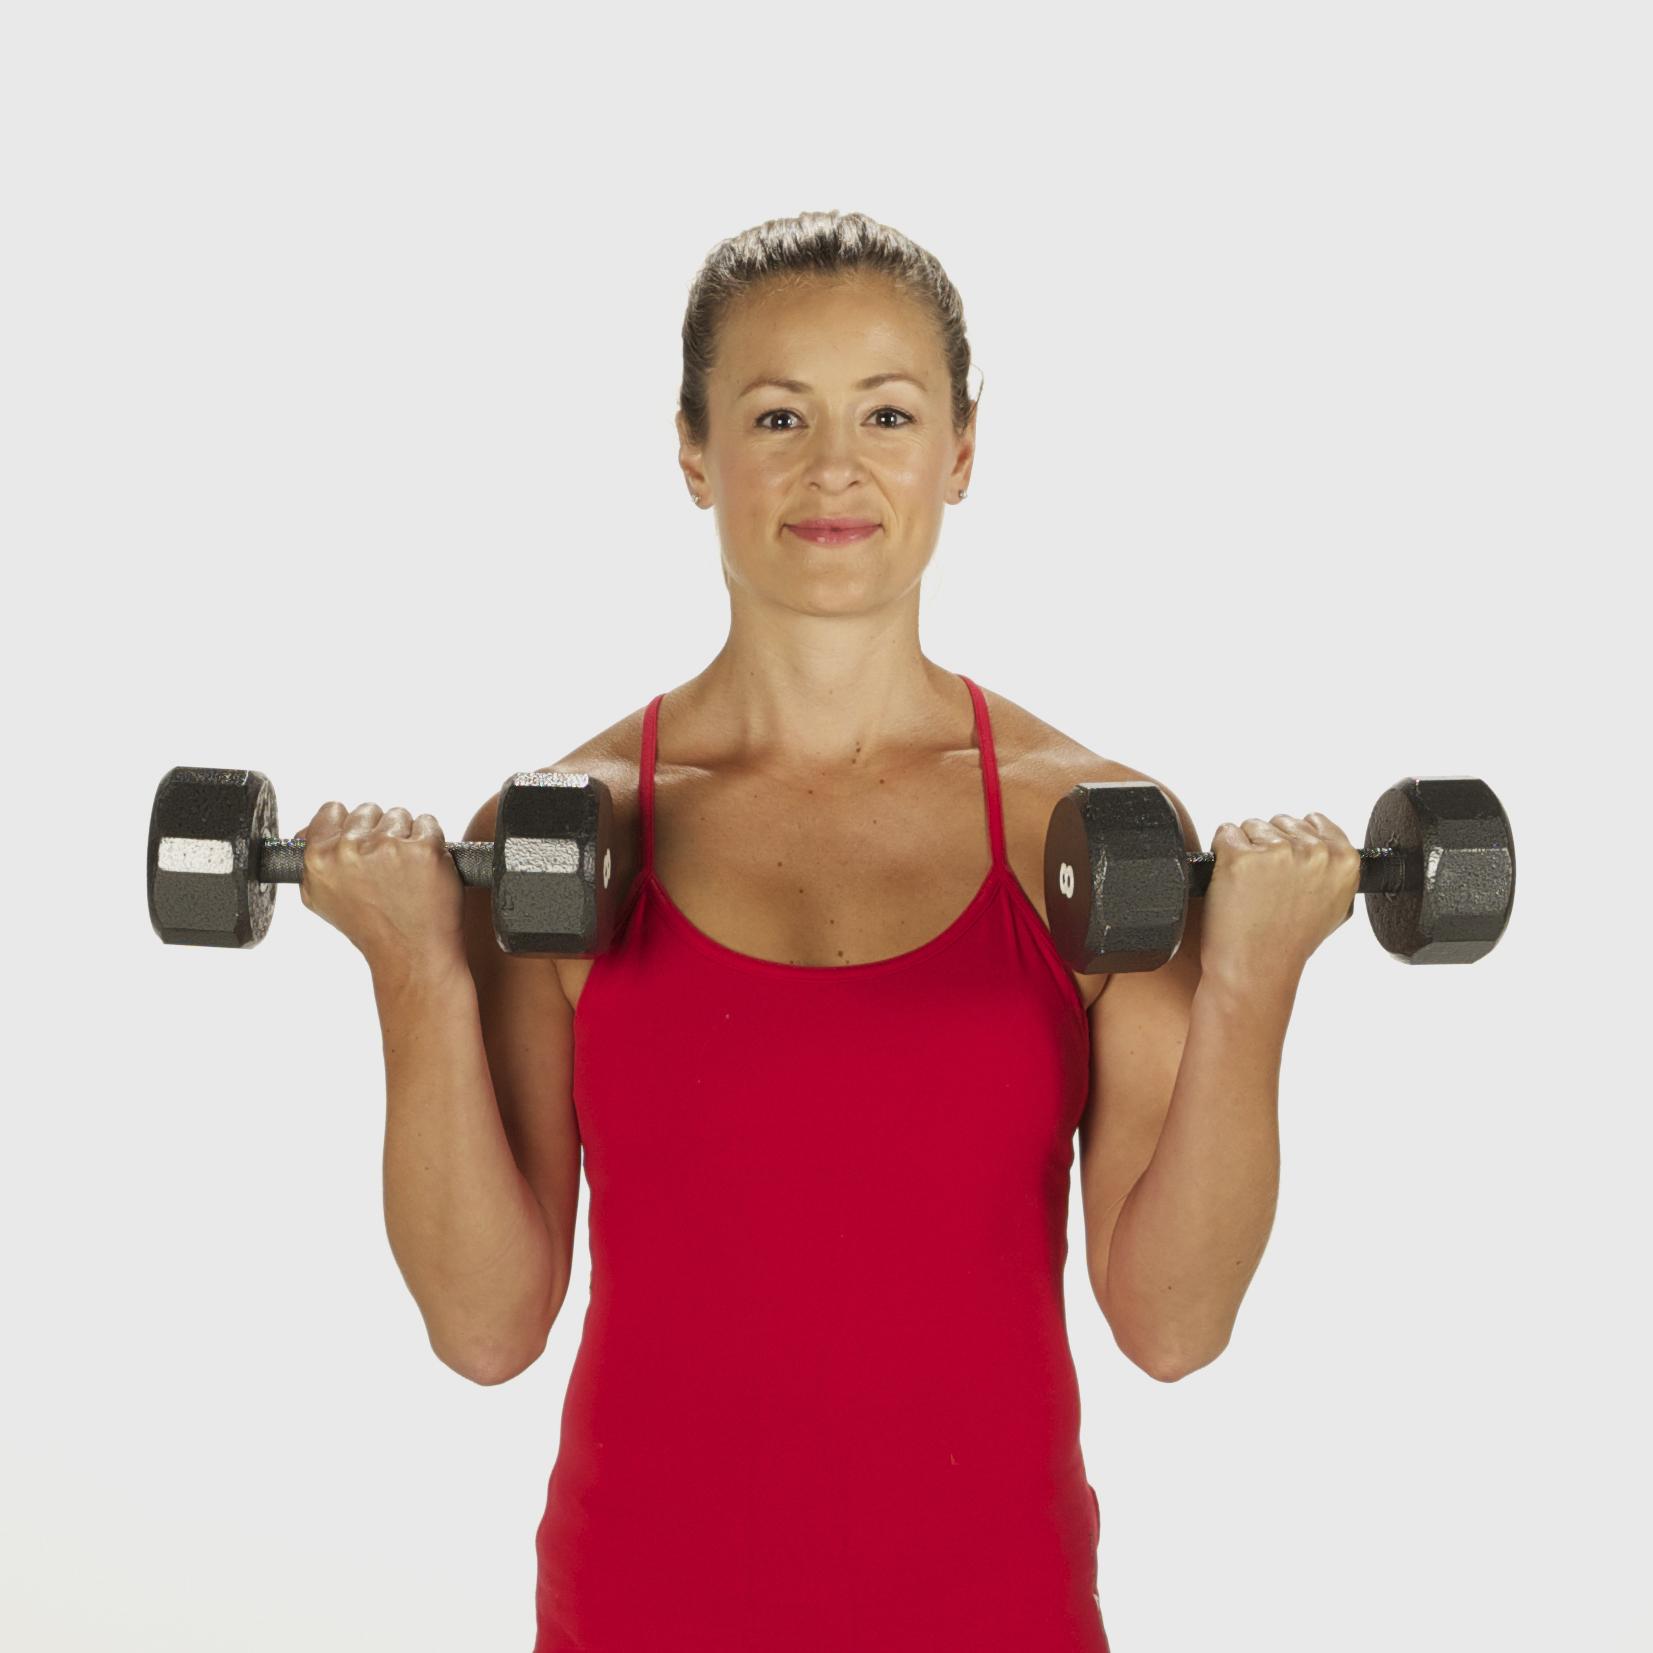 Towel Exercise Shoulder: 10-Minute Arm Workout Video